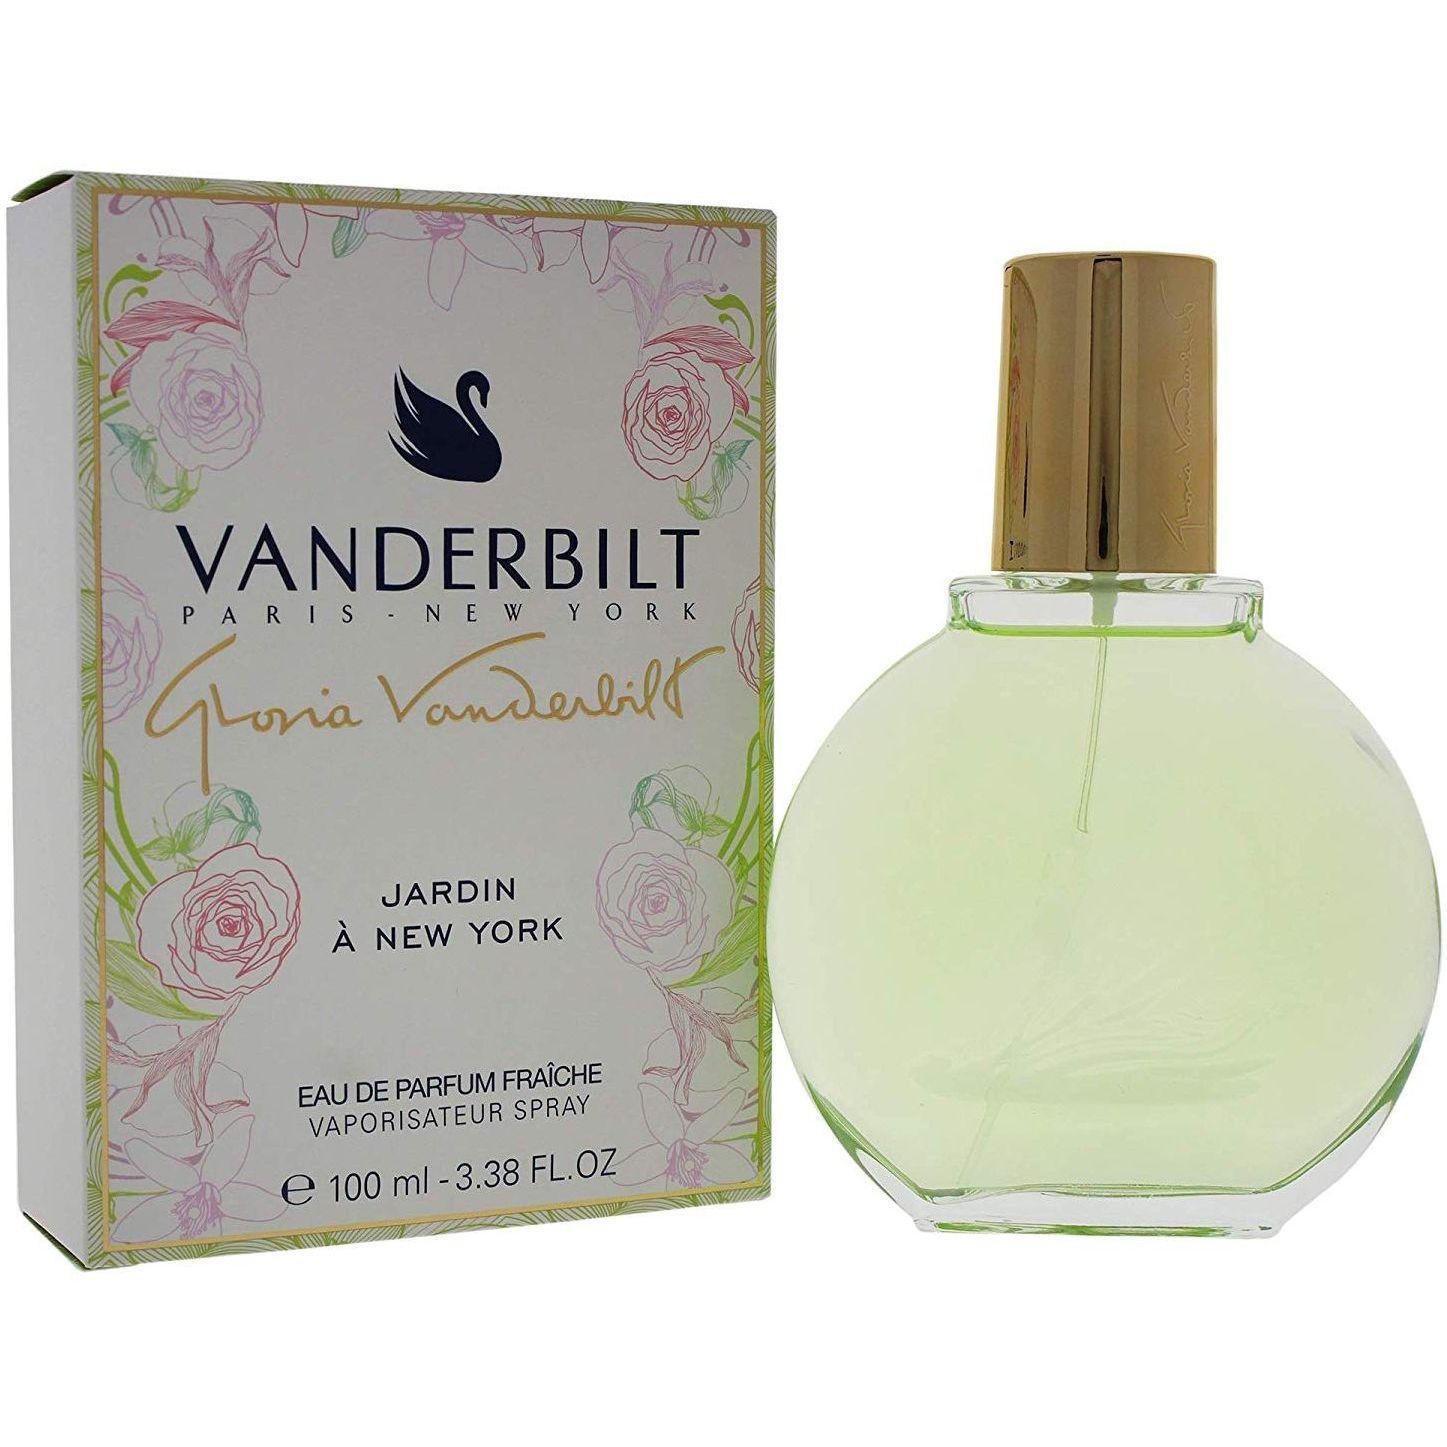 Gloria Vanderbilt Jardin a New York 100 ml Eau de Parfum Fraiche edp Profumo Donna